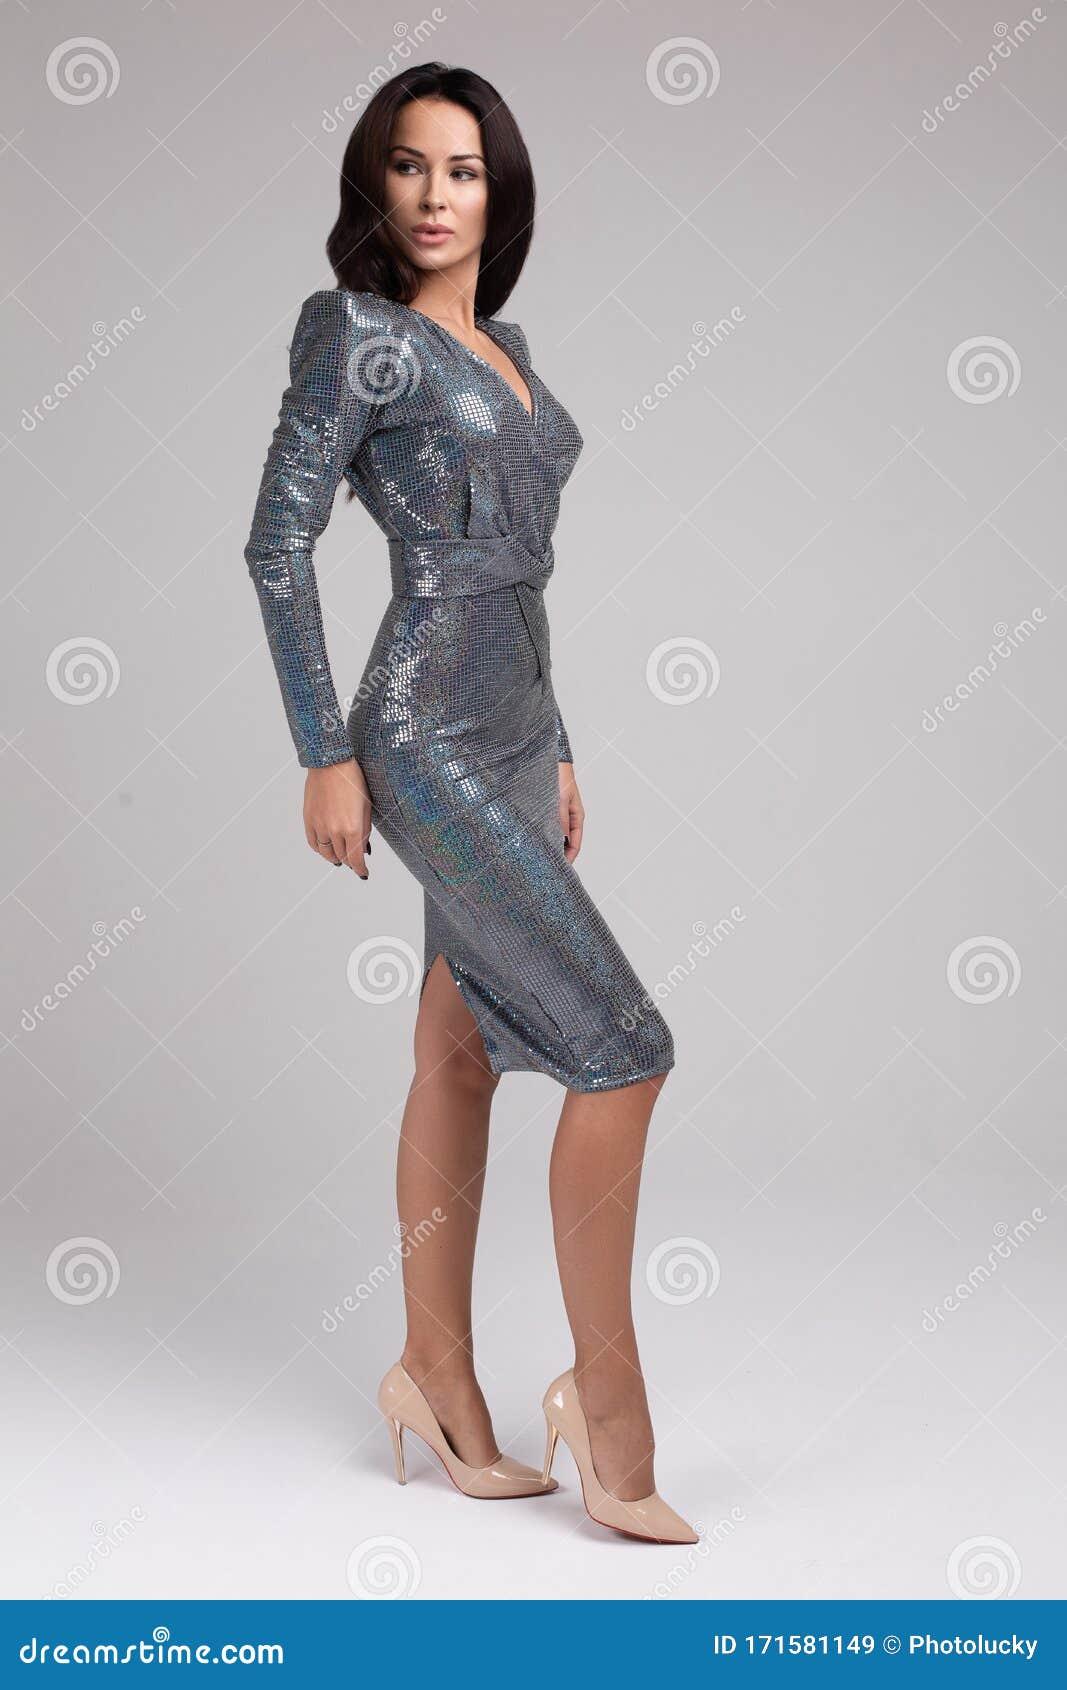 Shimmering Silver Cocktail Dress